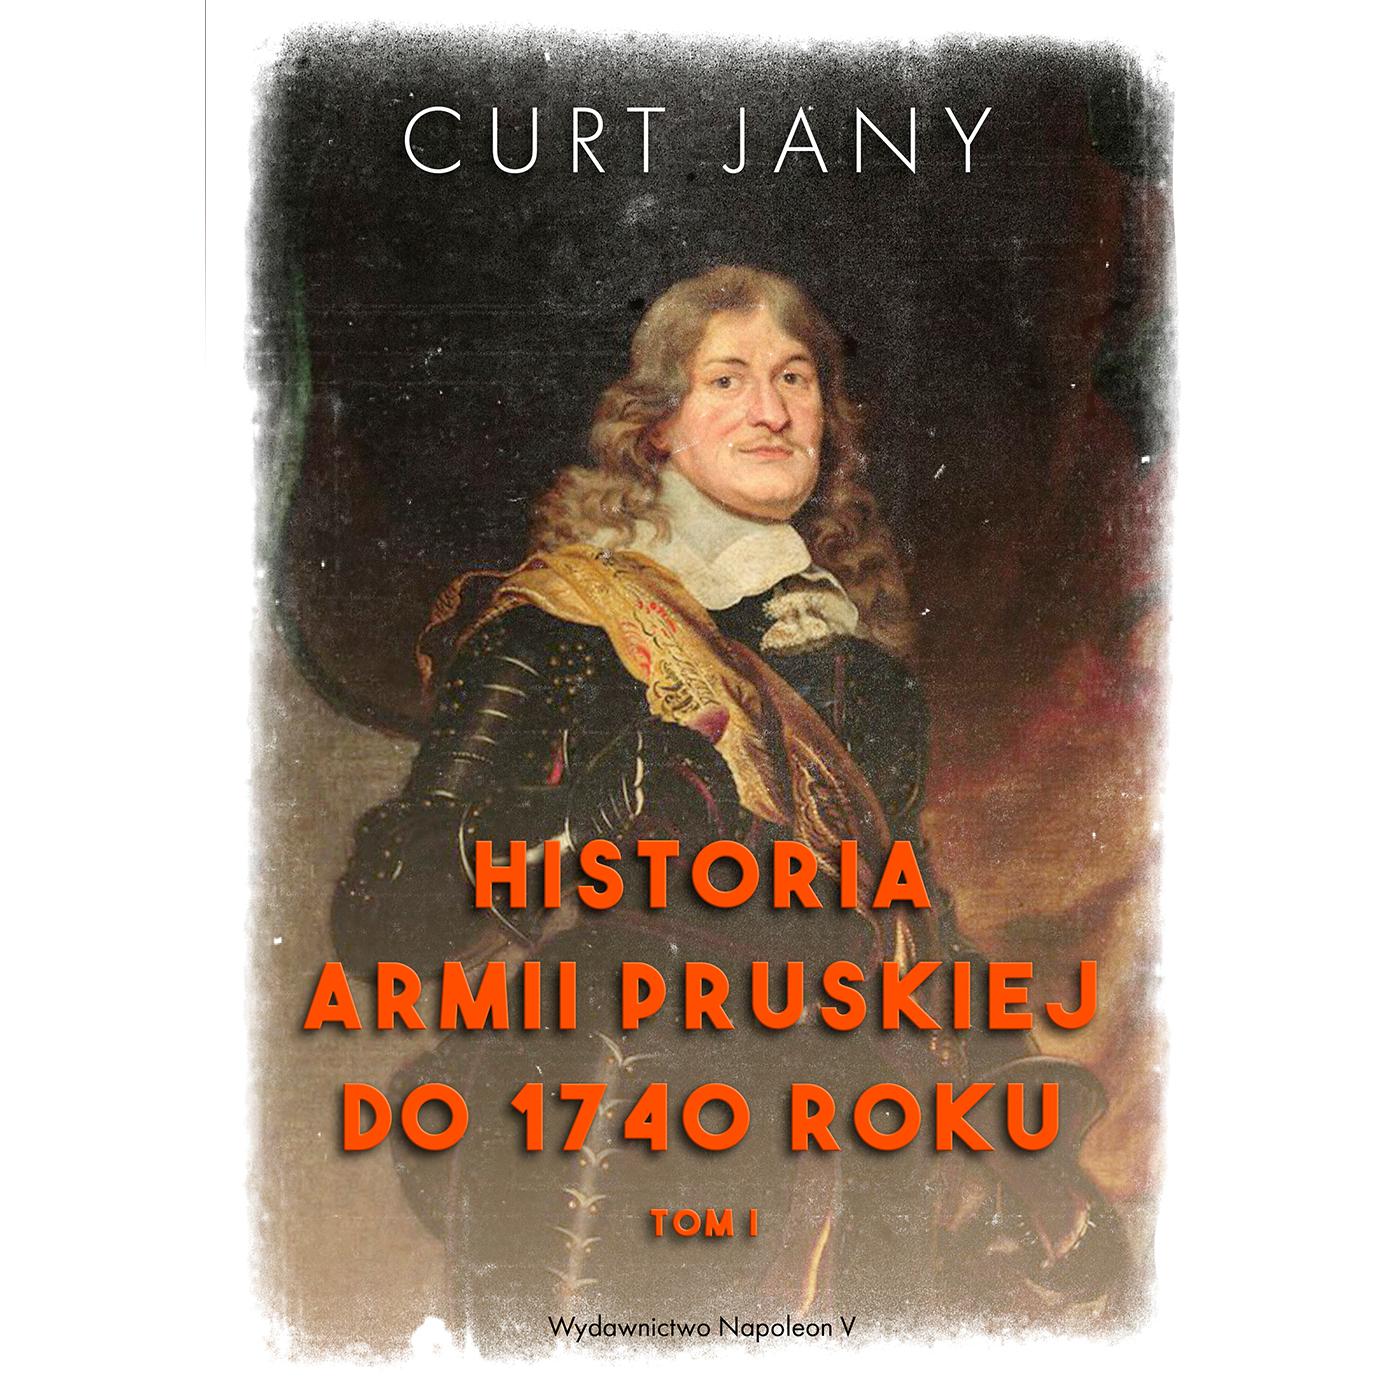 Historia armii pruskiej do 1740 roku. Tom I